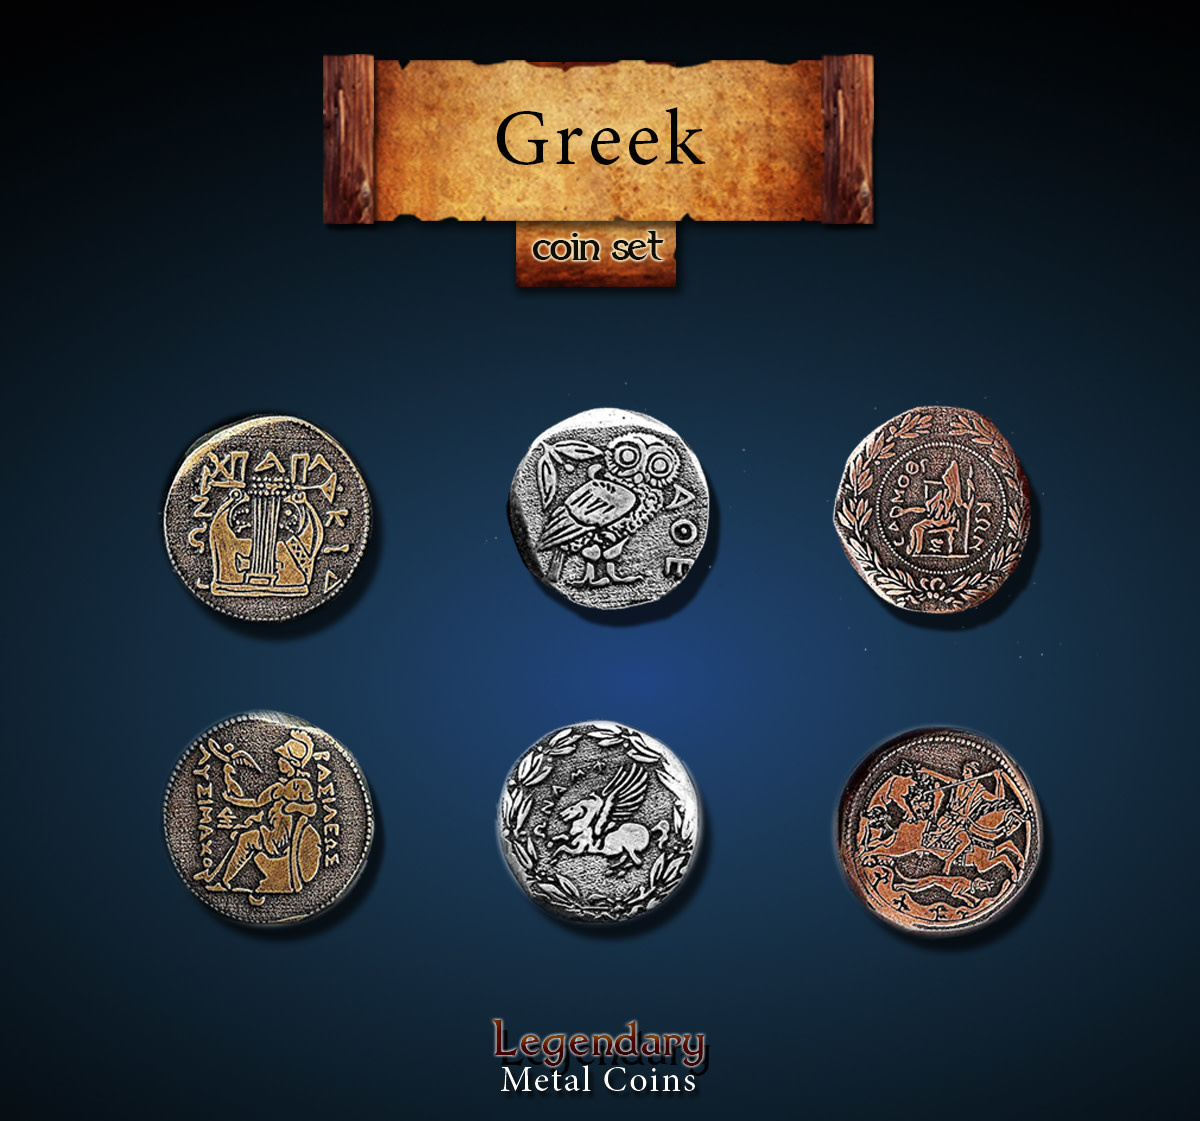 Legendary Metal Coins: Greek (24pcs)